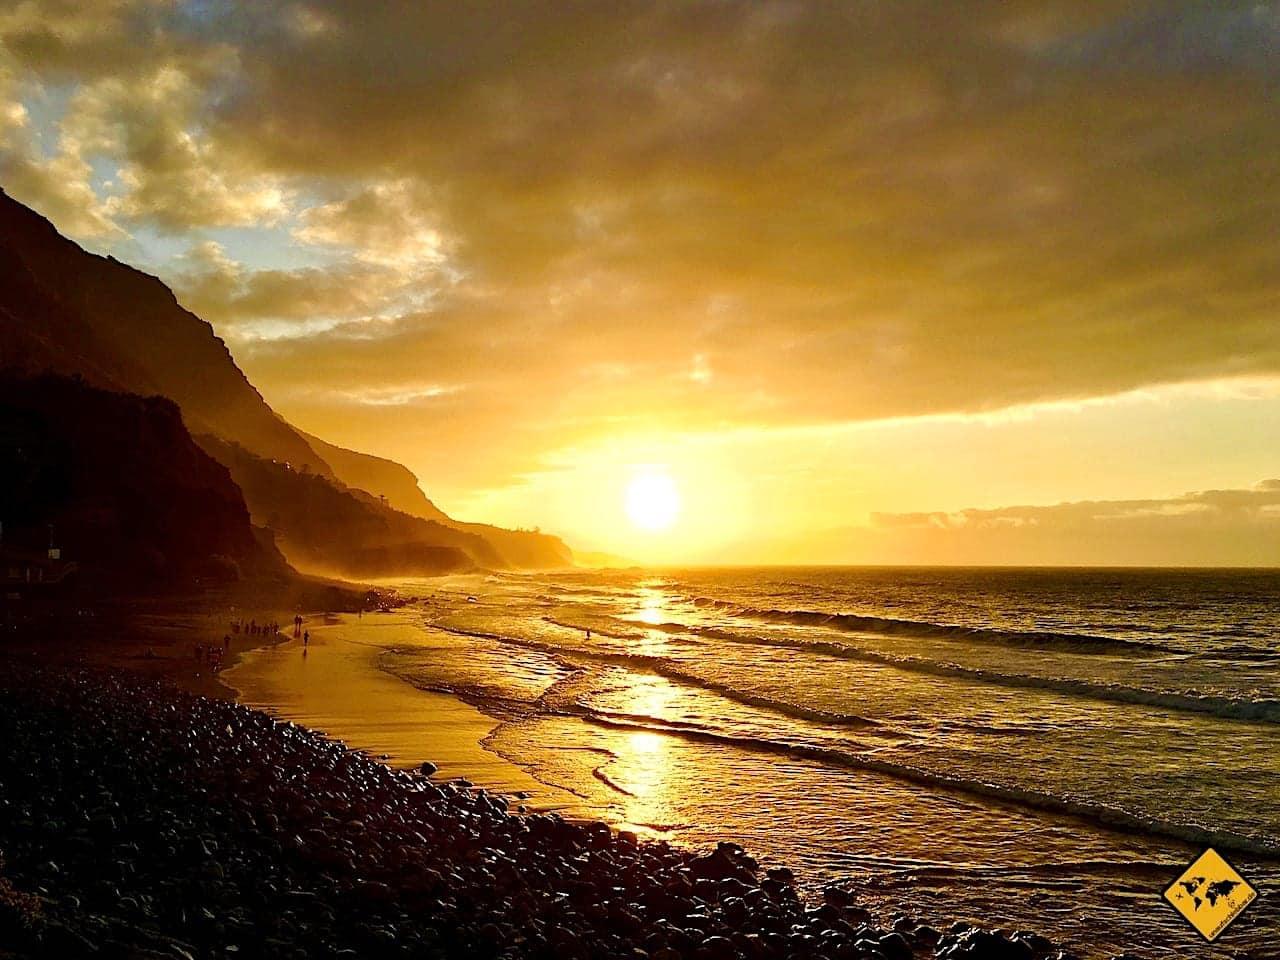 Sonnenuntergang Foto iPhone 6S